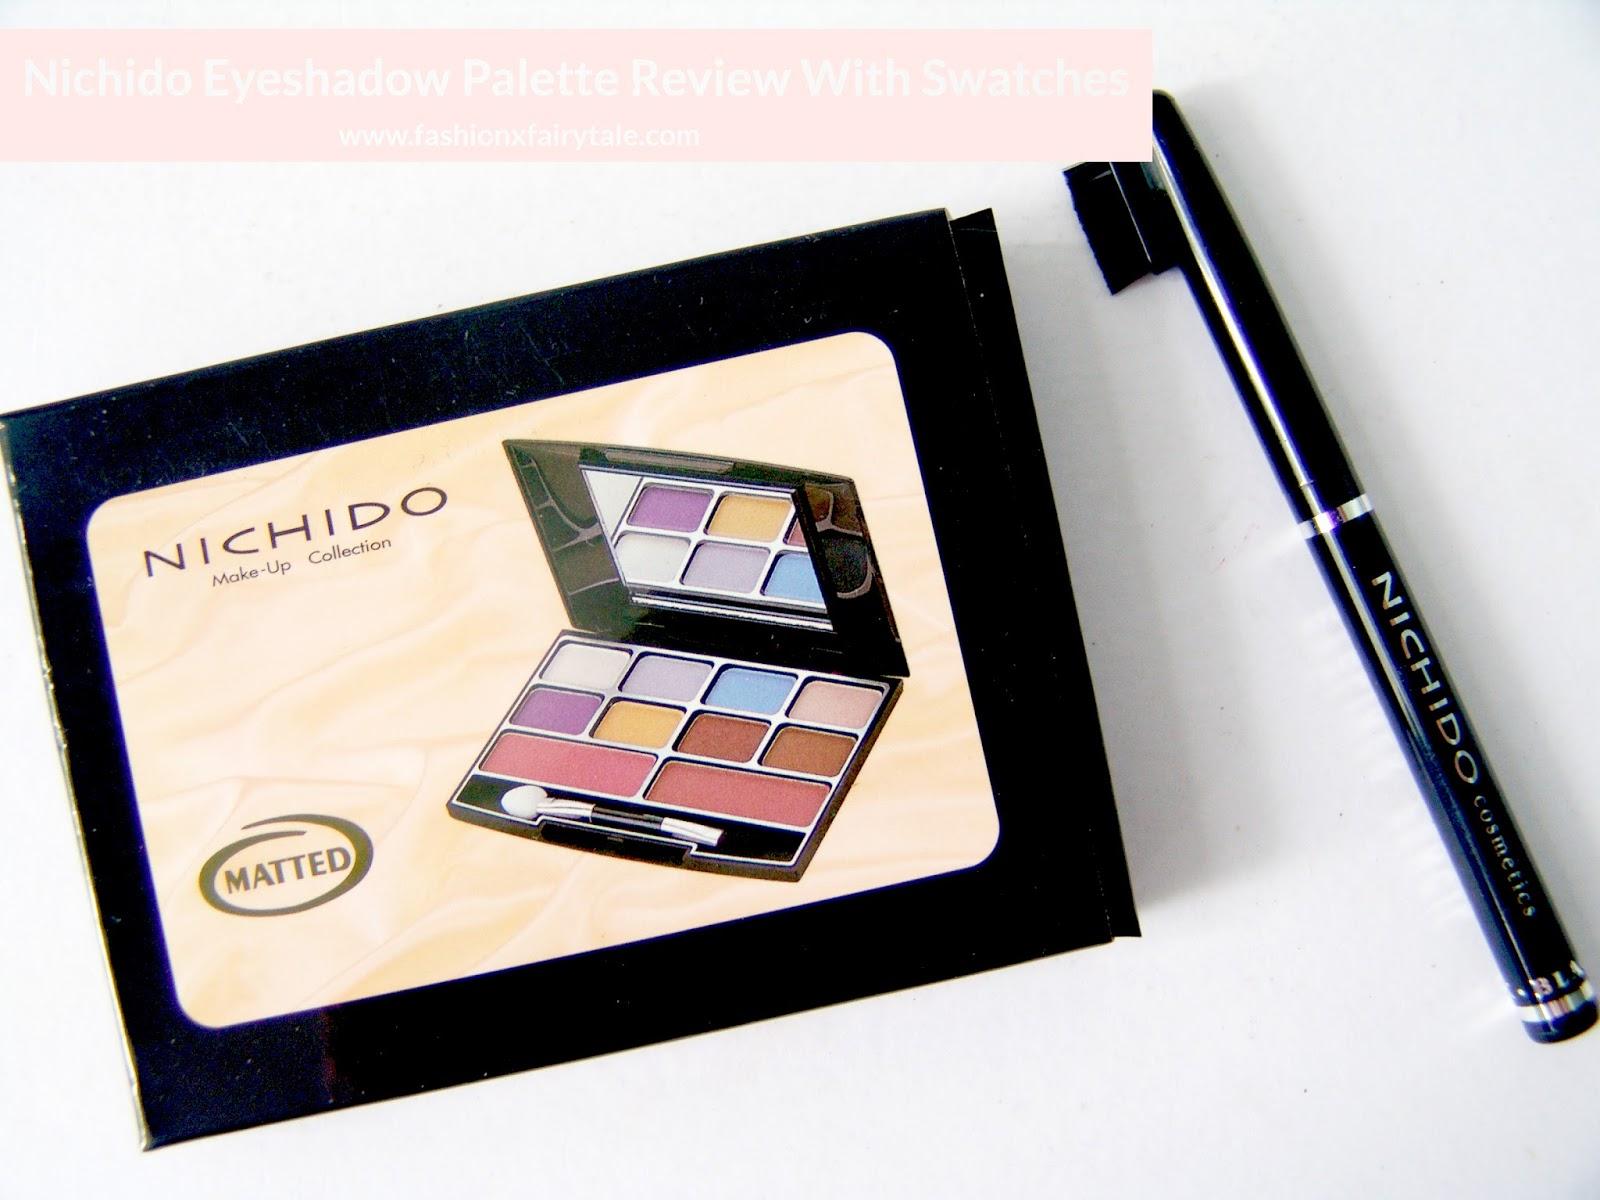 Nichido Eyeshadow Palette | Review & Swatches